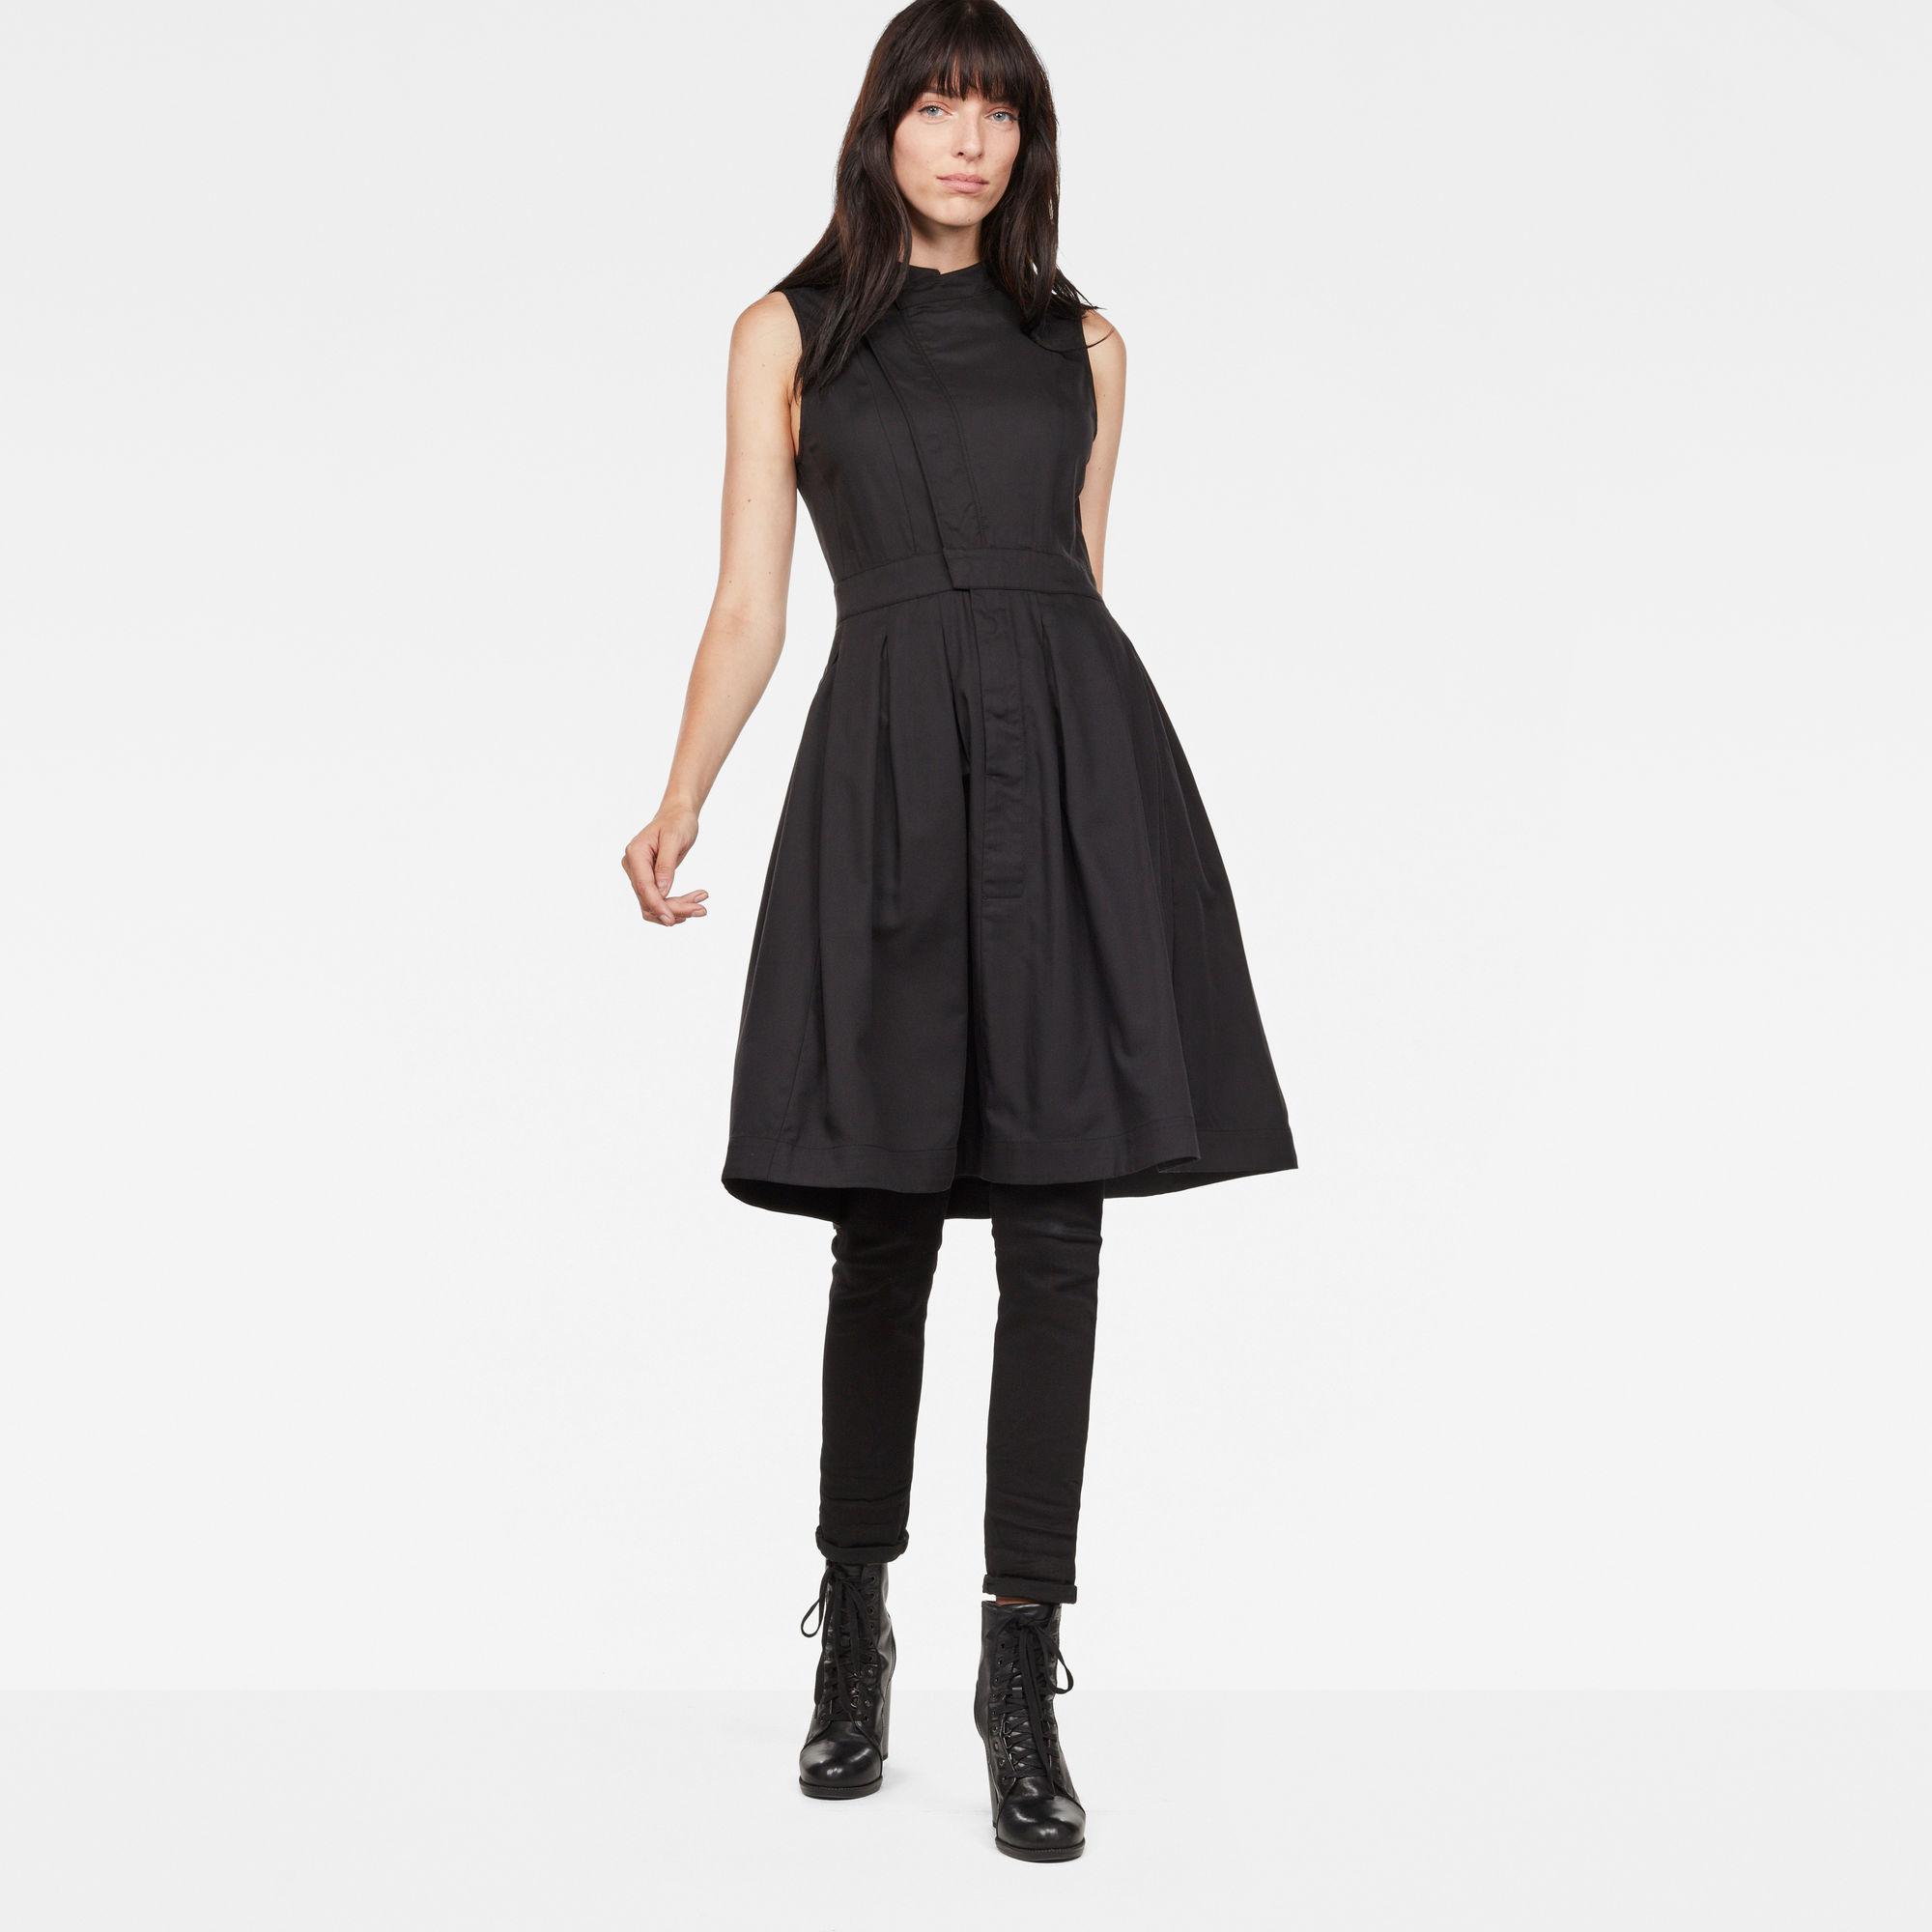 Hybrid Archive Deconstructed Pleated Sleeveless Shirt Dress